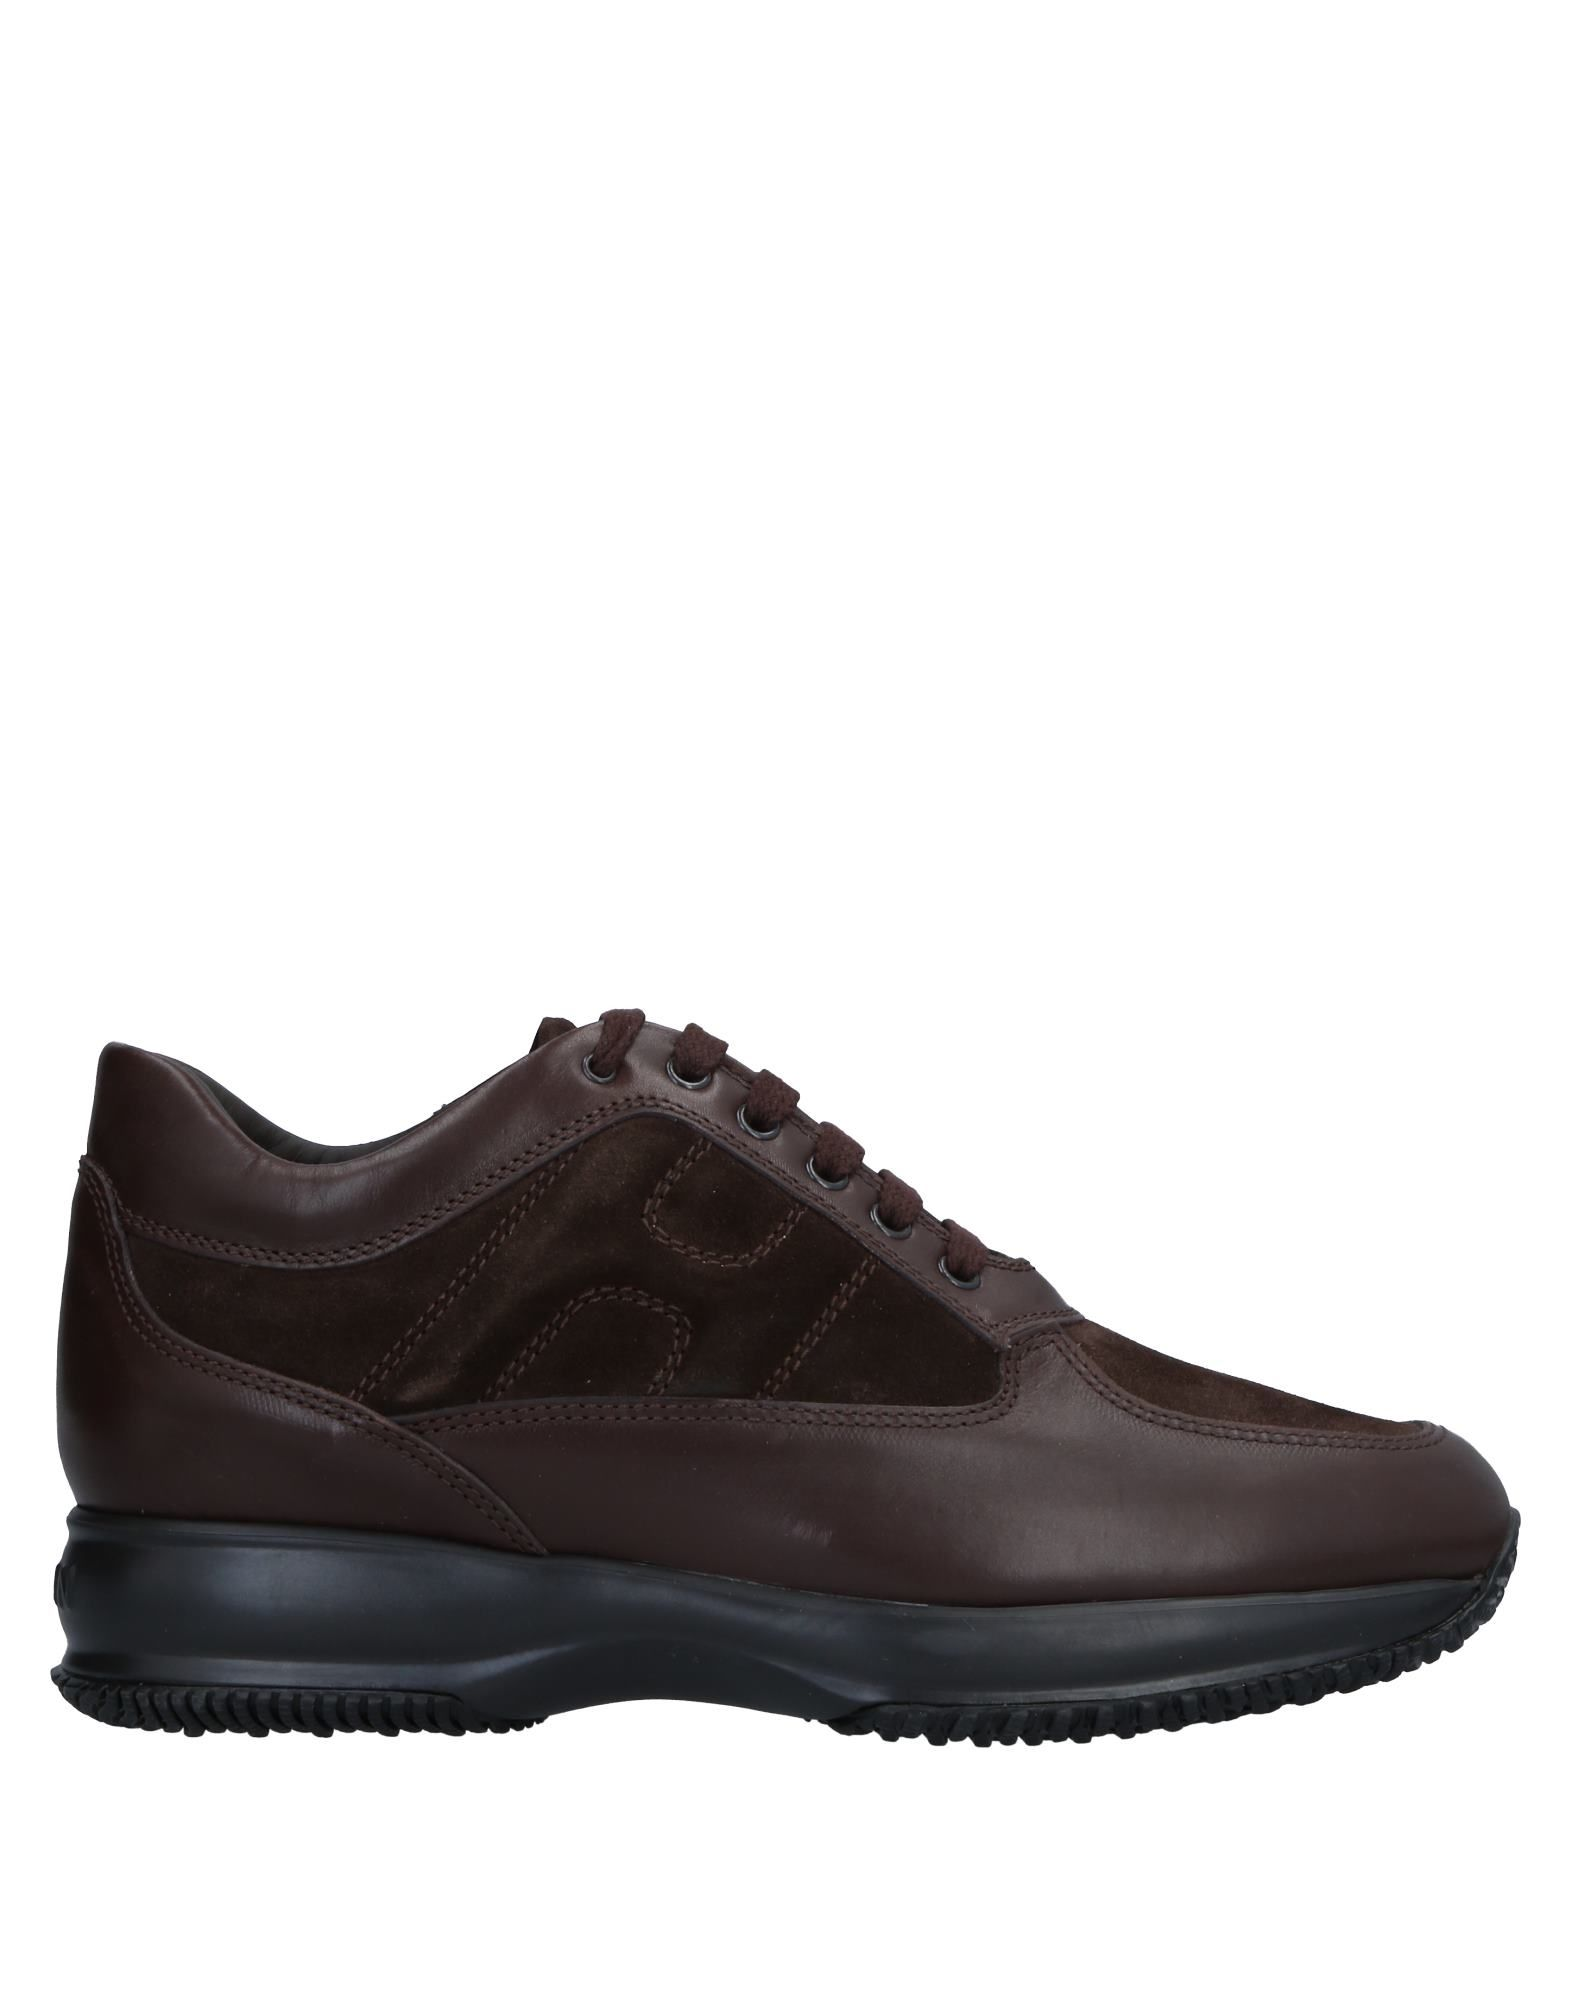 Moda Sneakers Hogan Uomo - 11199065UN